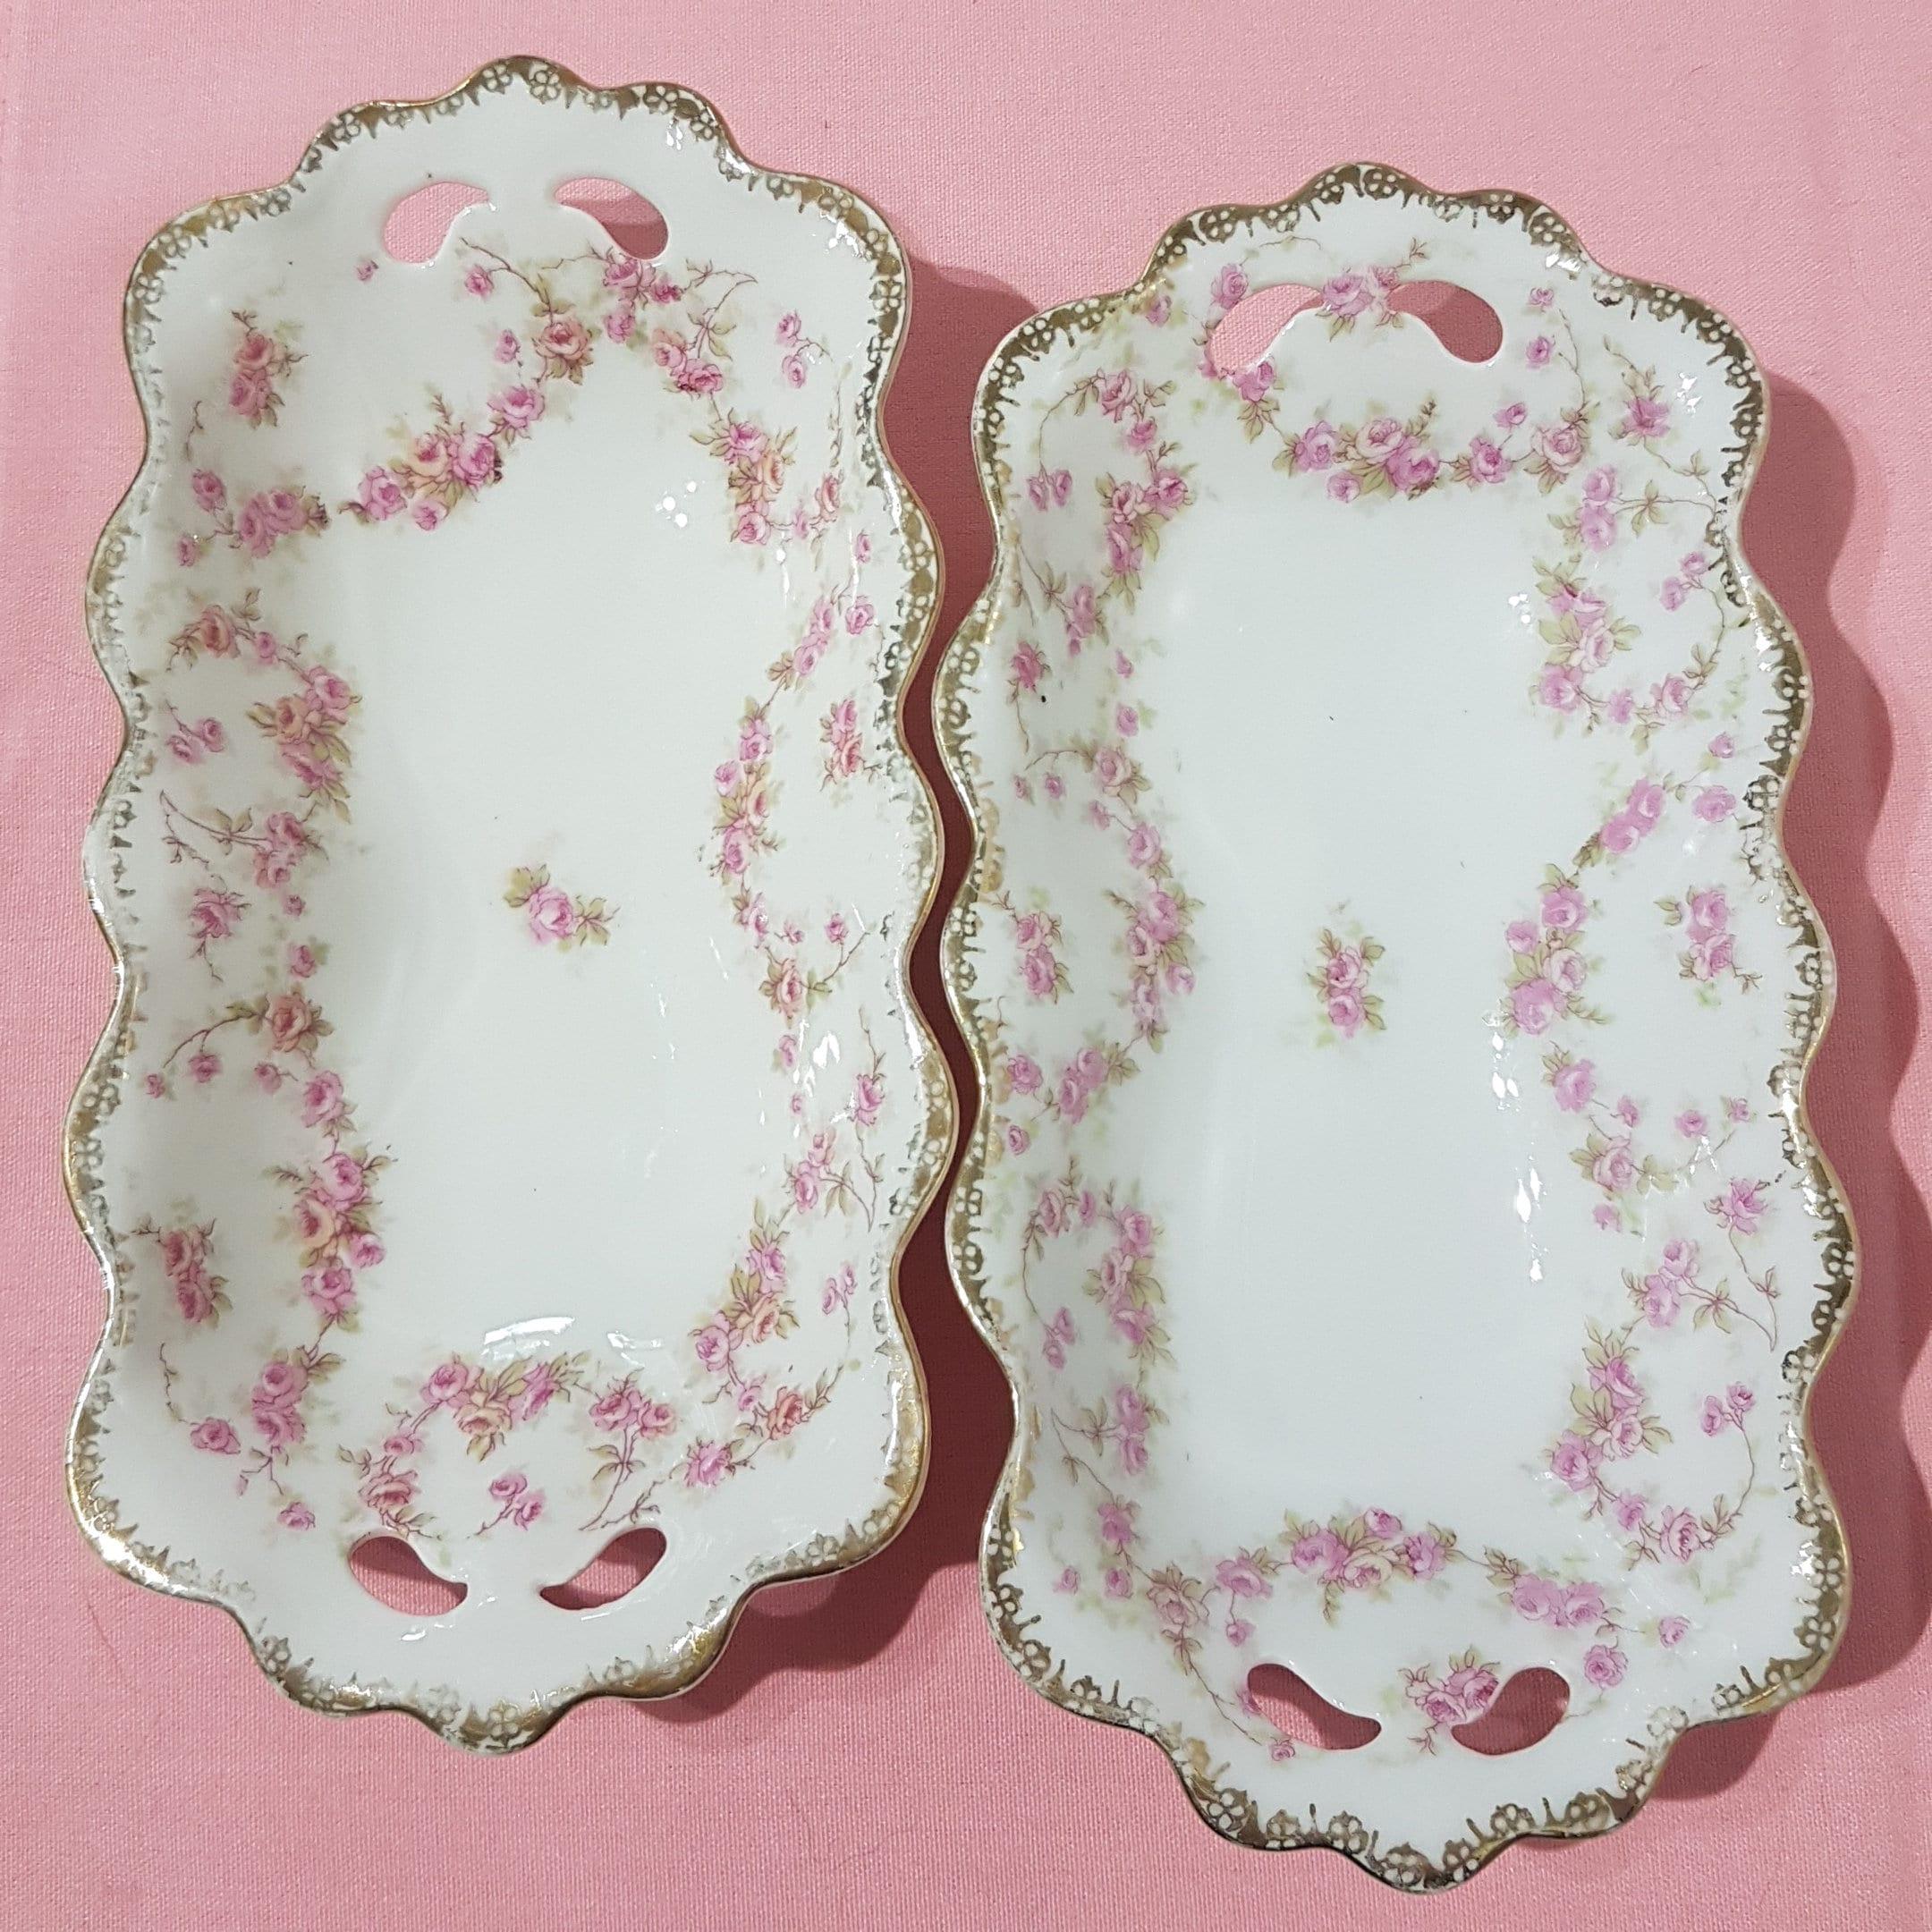 Antique Mz Austria Altrohlau Bridal Rose Celery Dishes Small